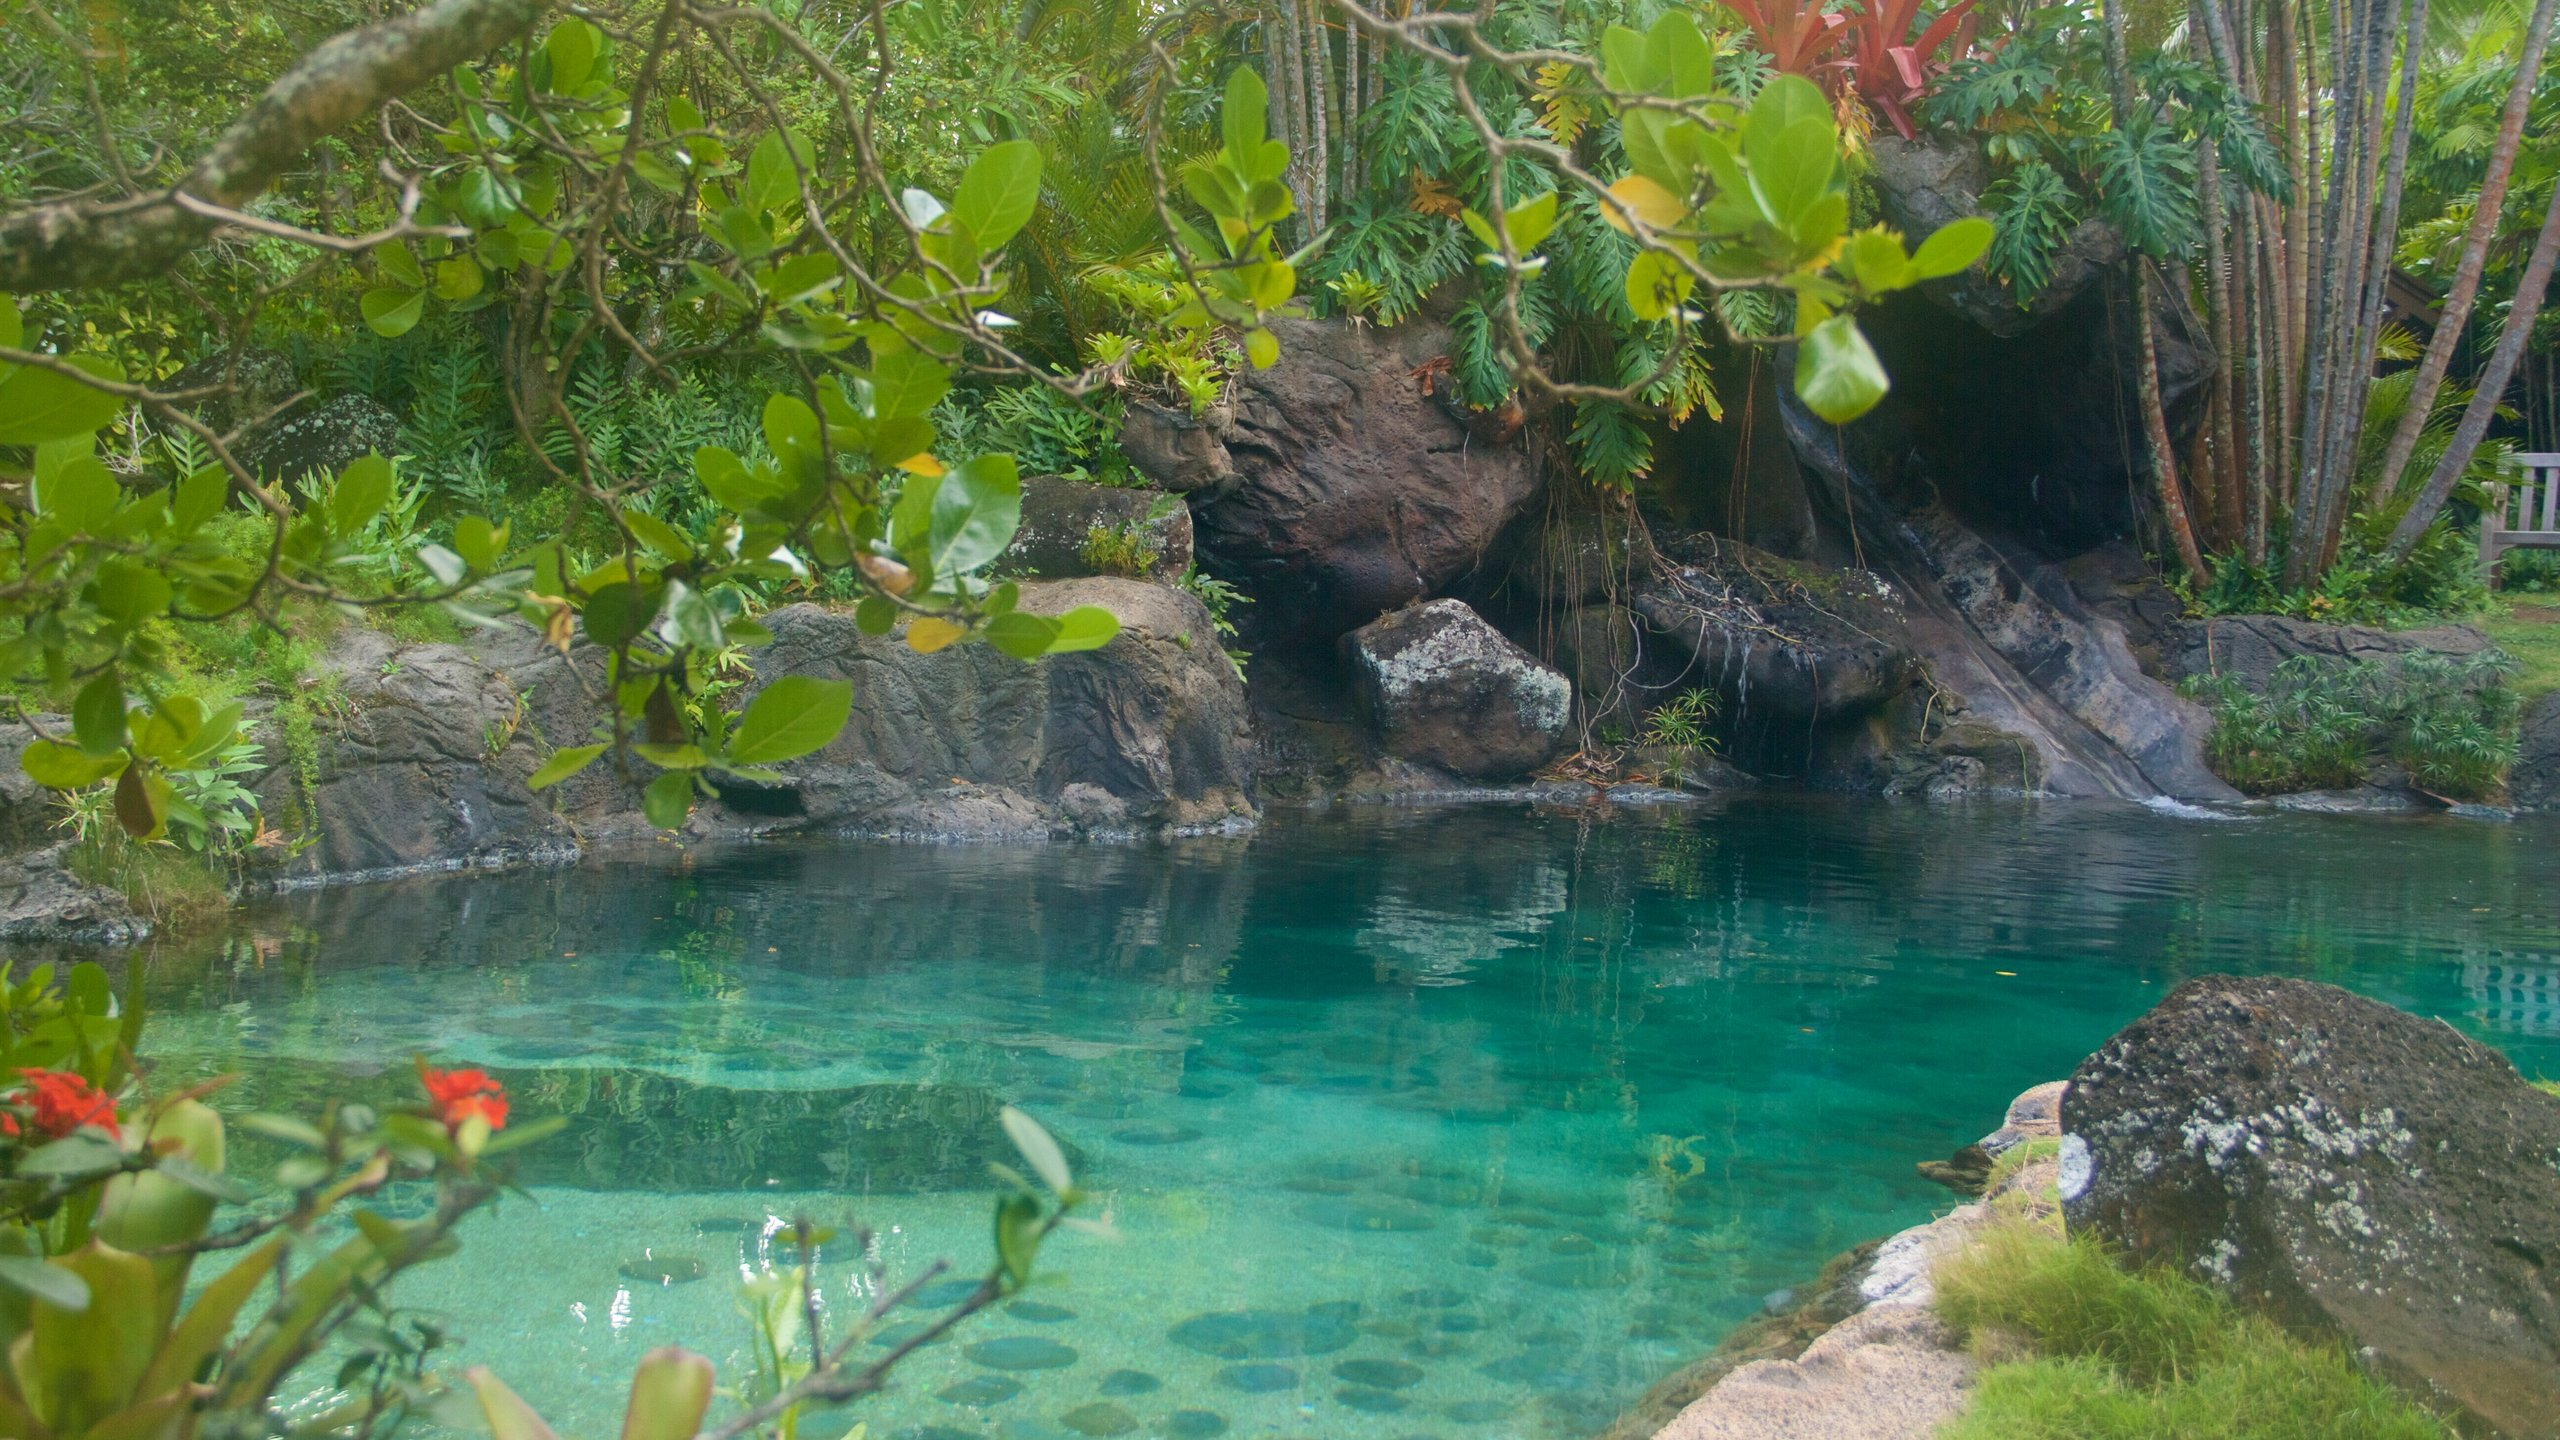 Kilauea, Hawaii, United States of America